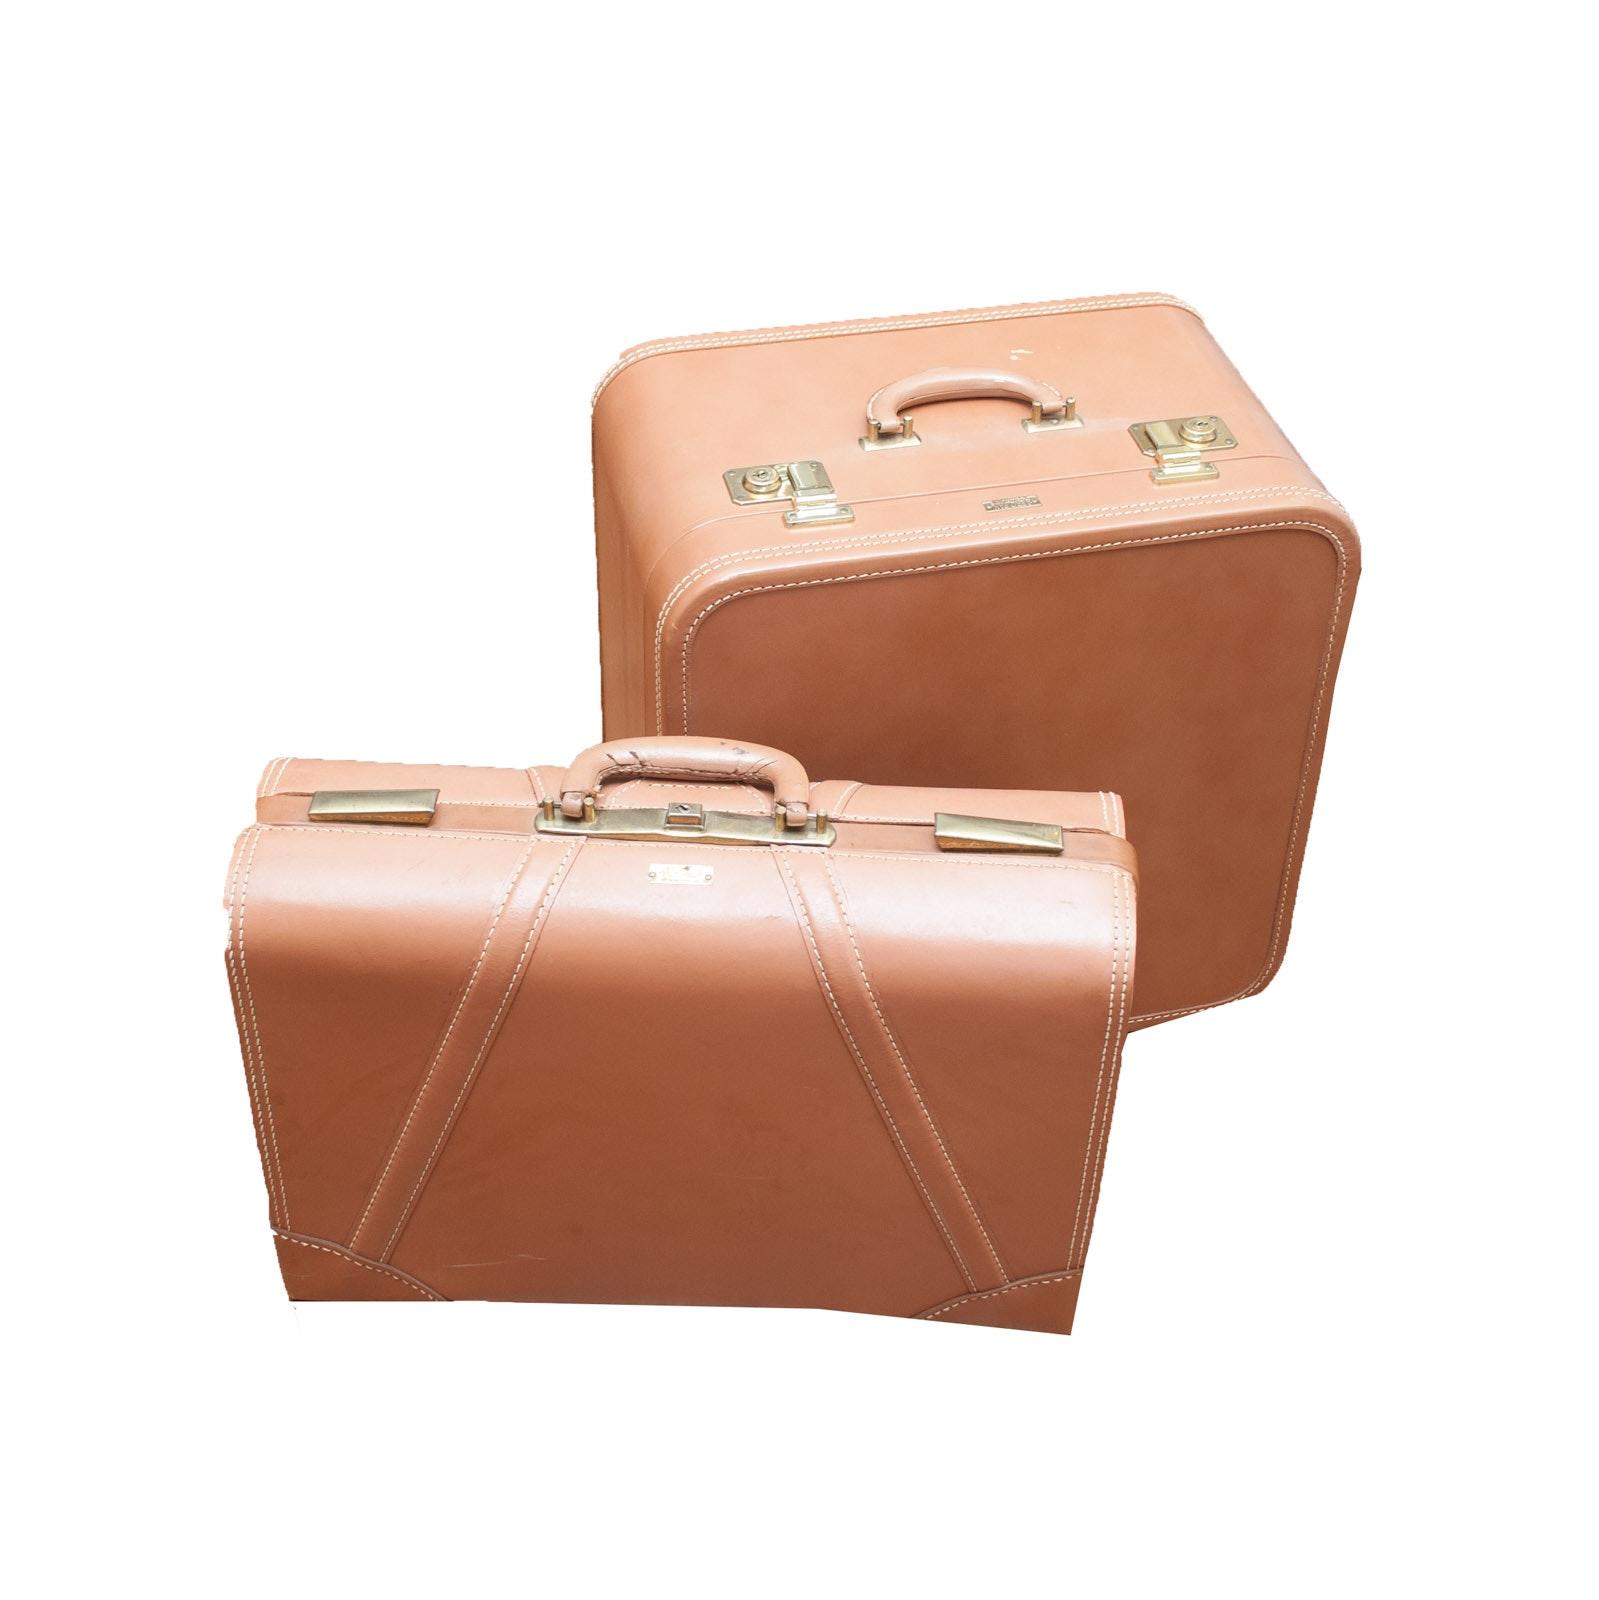 Pair of Aero-Pak Deluxe Modern Luggage